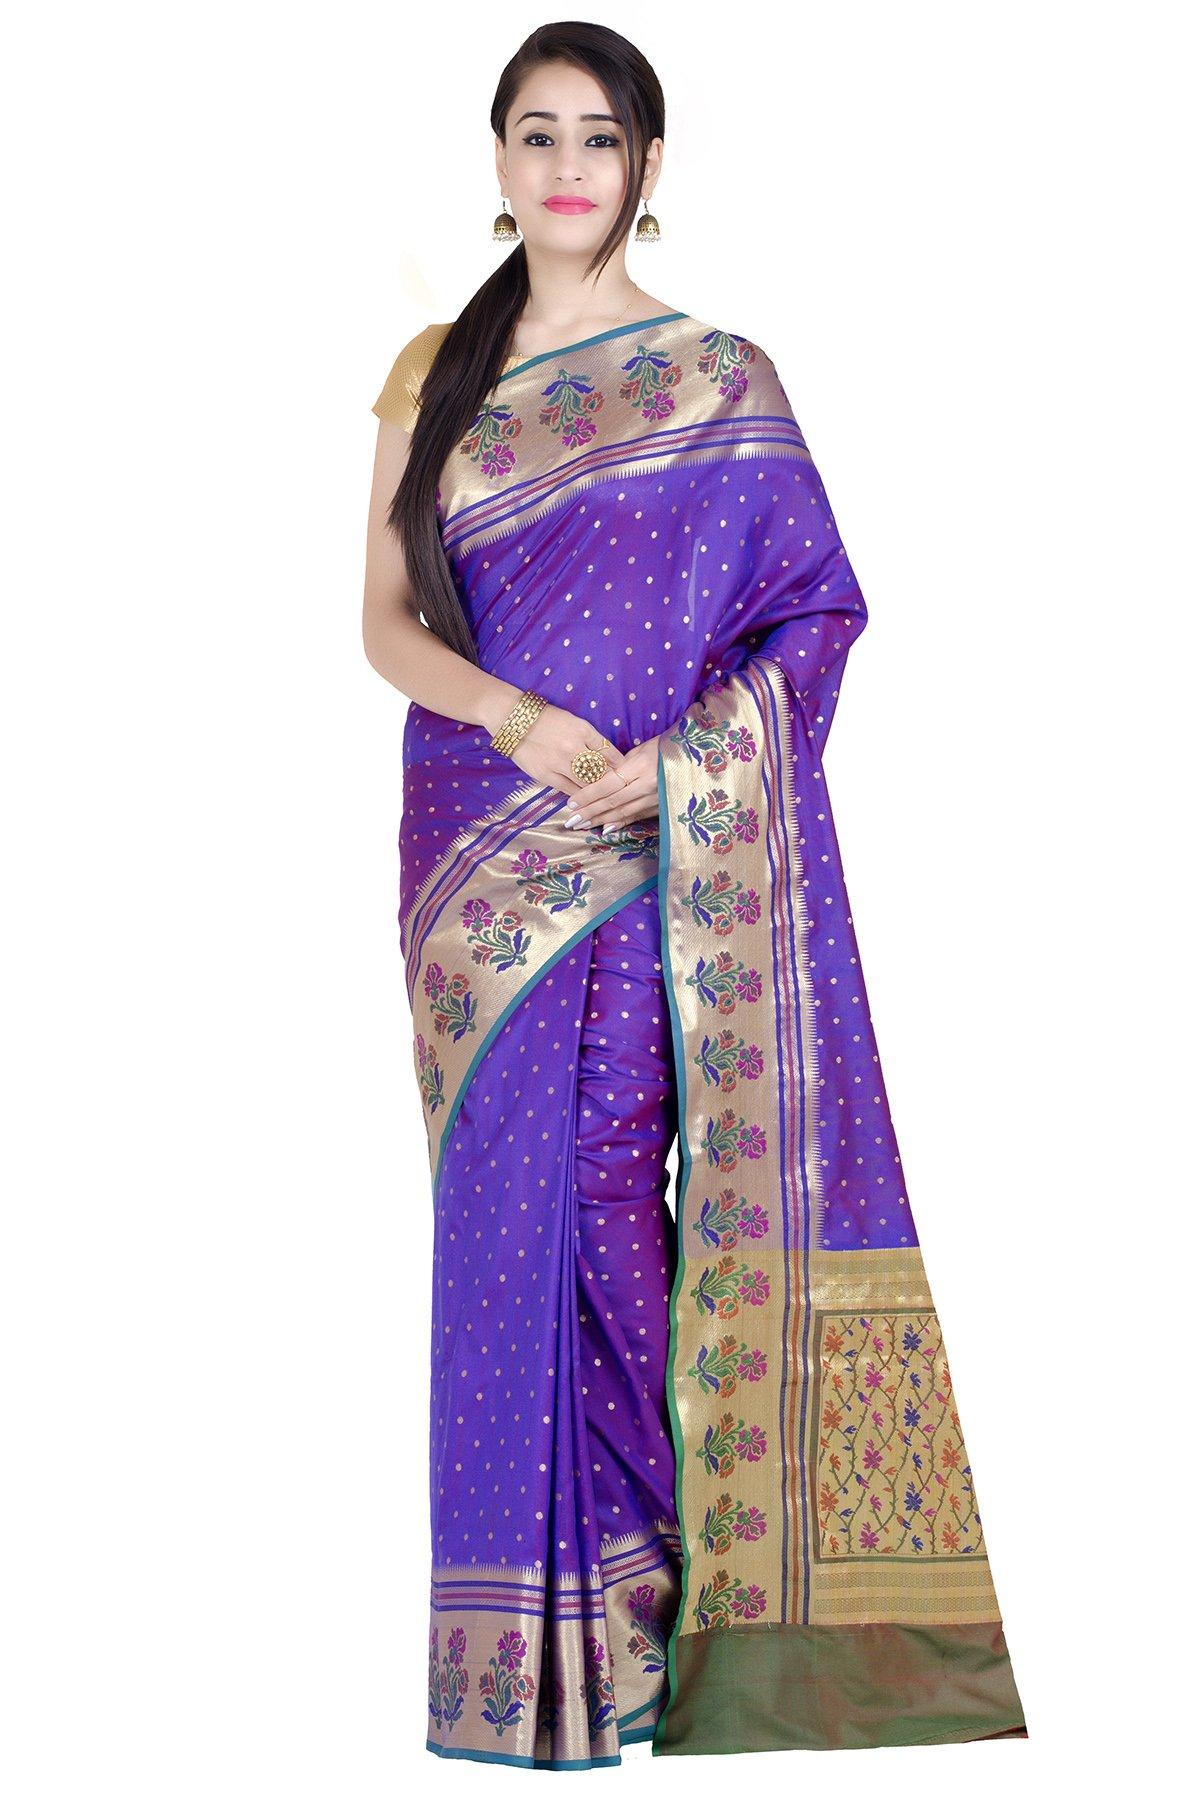 Chandrakala Women's Purple Kataan Silk Blend Banarasi Saree(1285PUR)